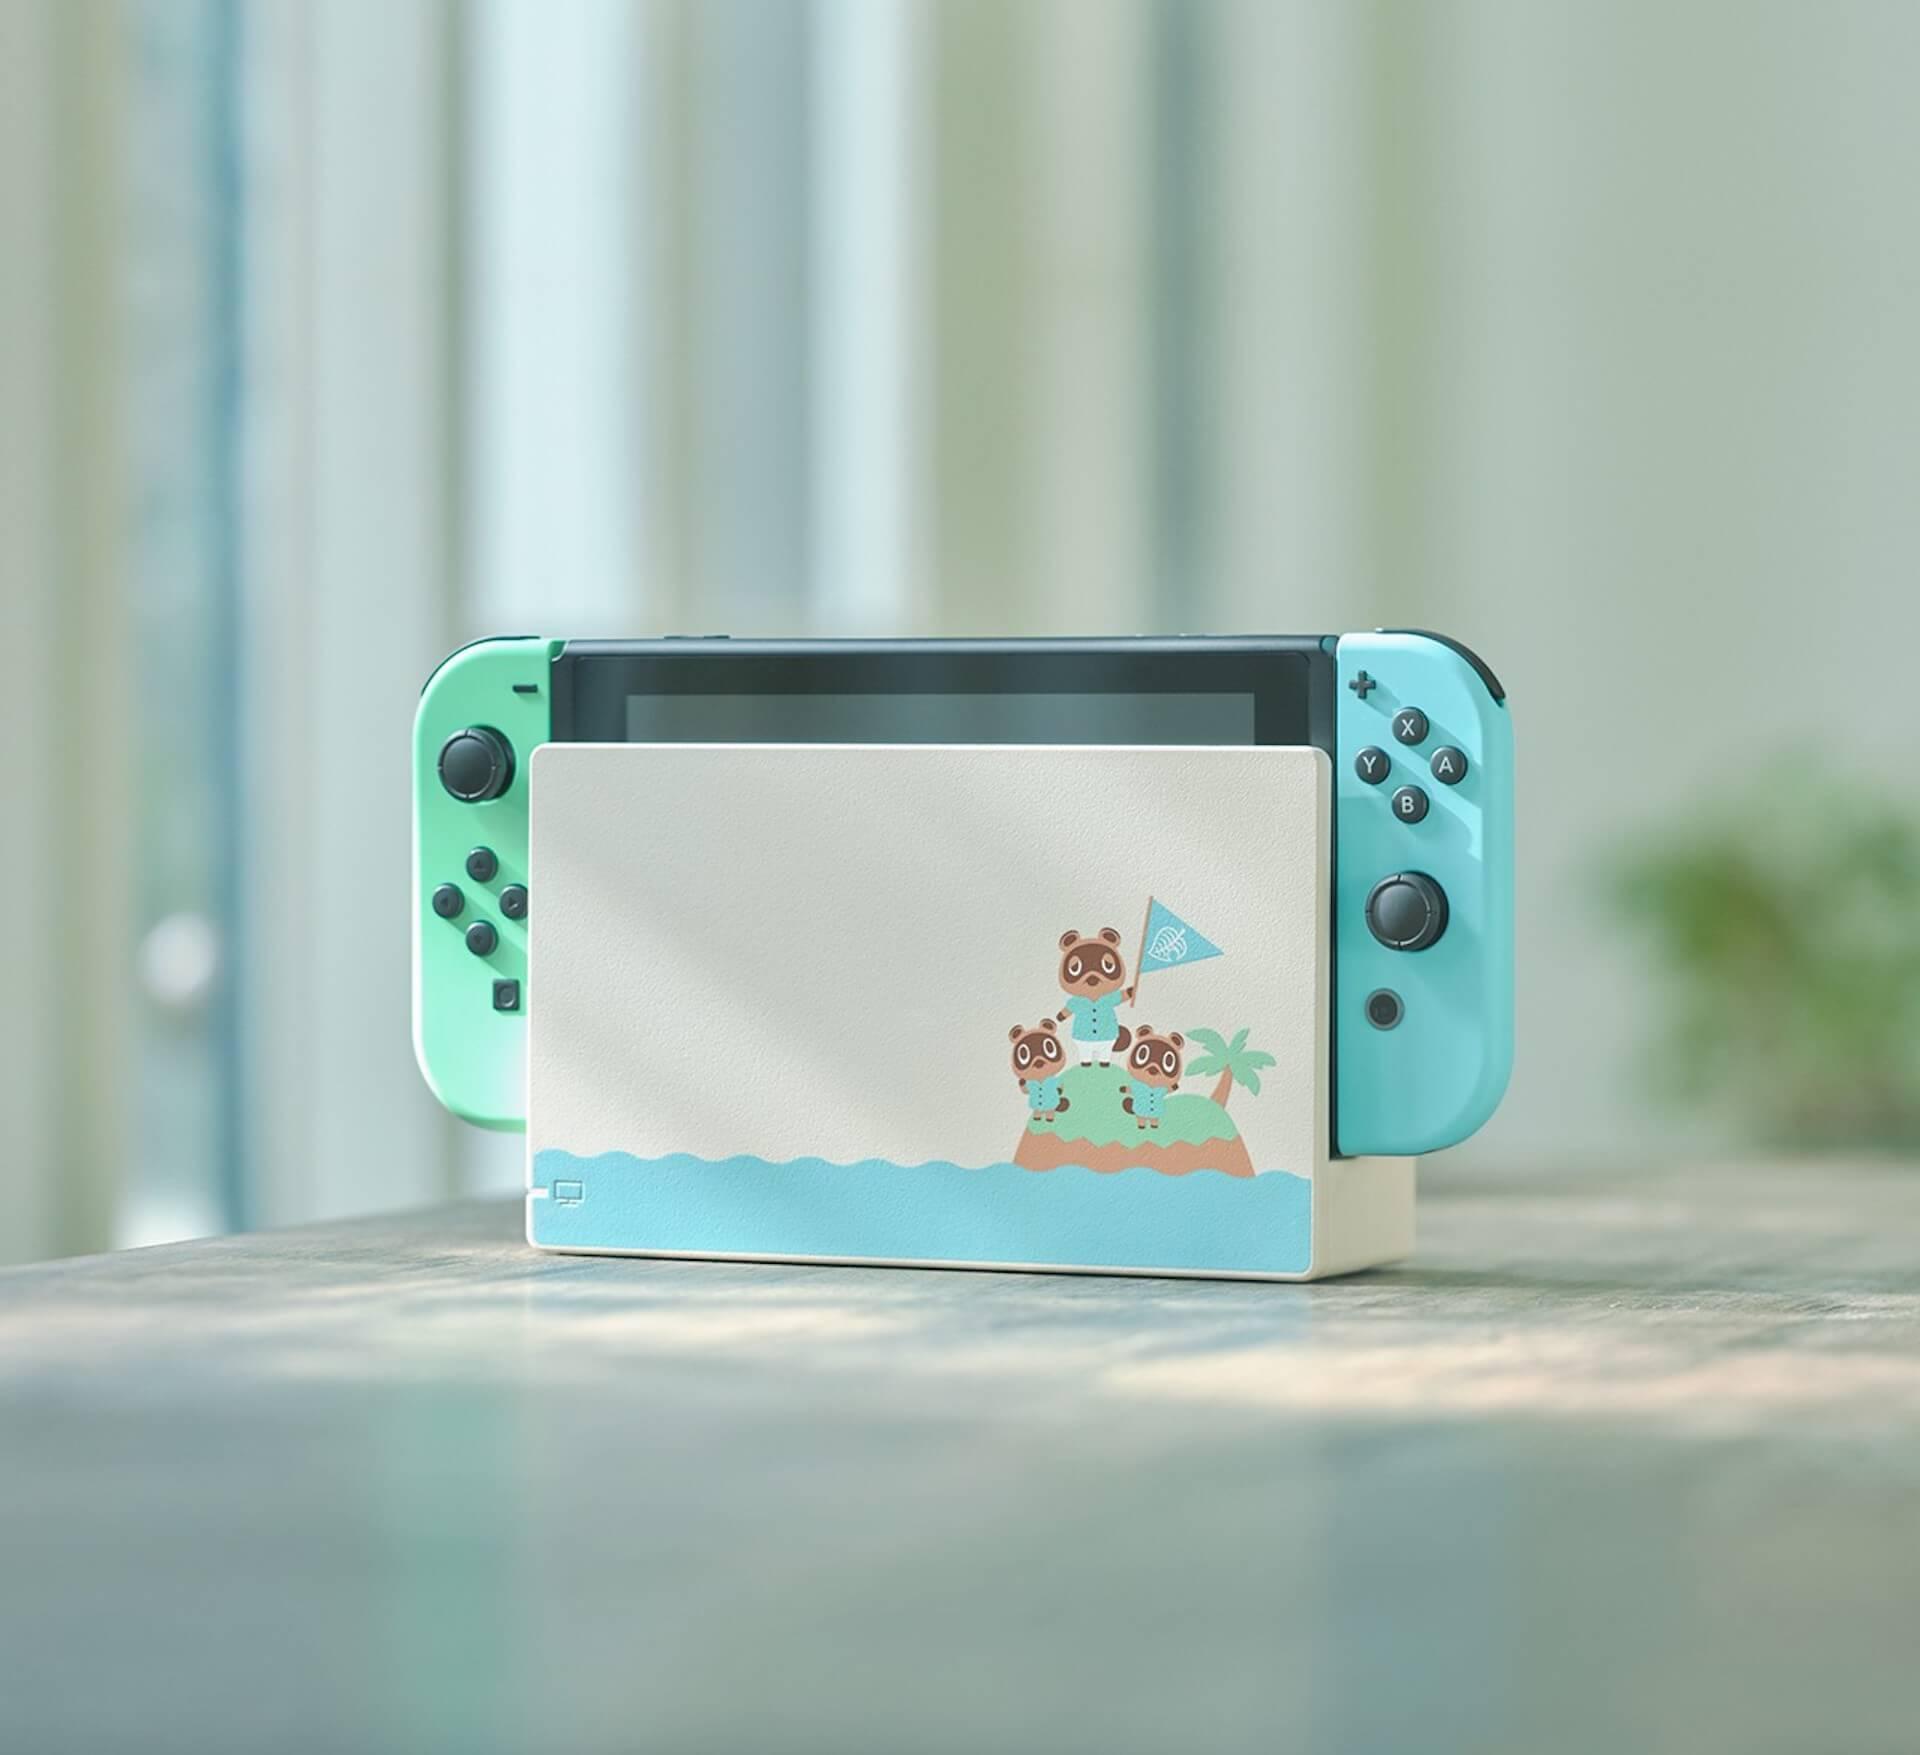 Nintendo Switchの供給不足がようやく解消か?夏前に供給回復の可能性 tech200514_nintendoswitch_main